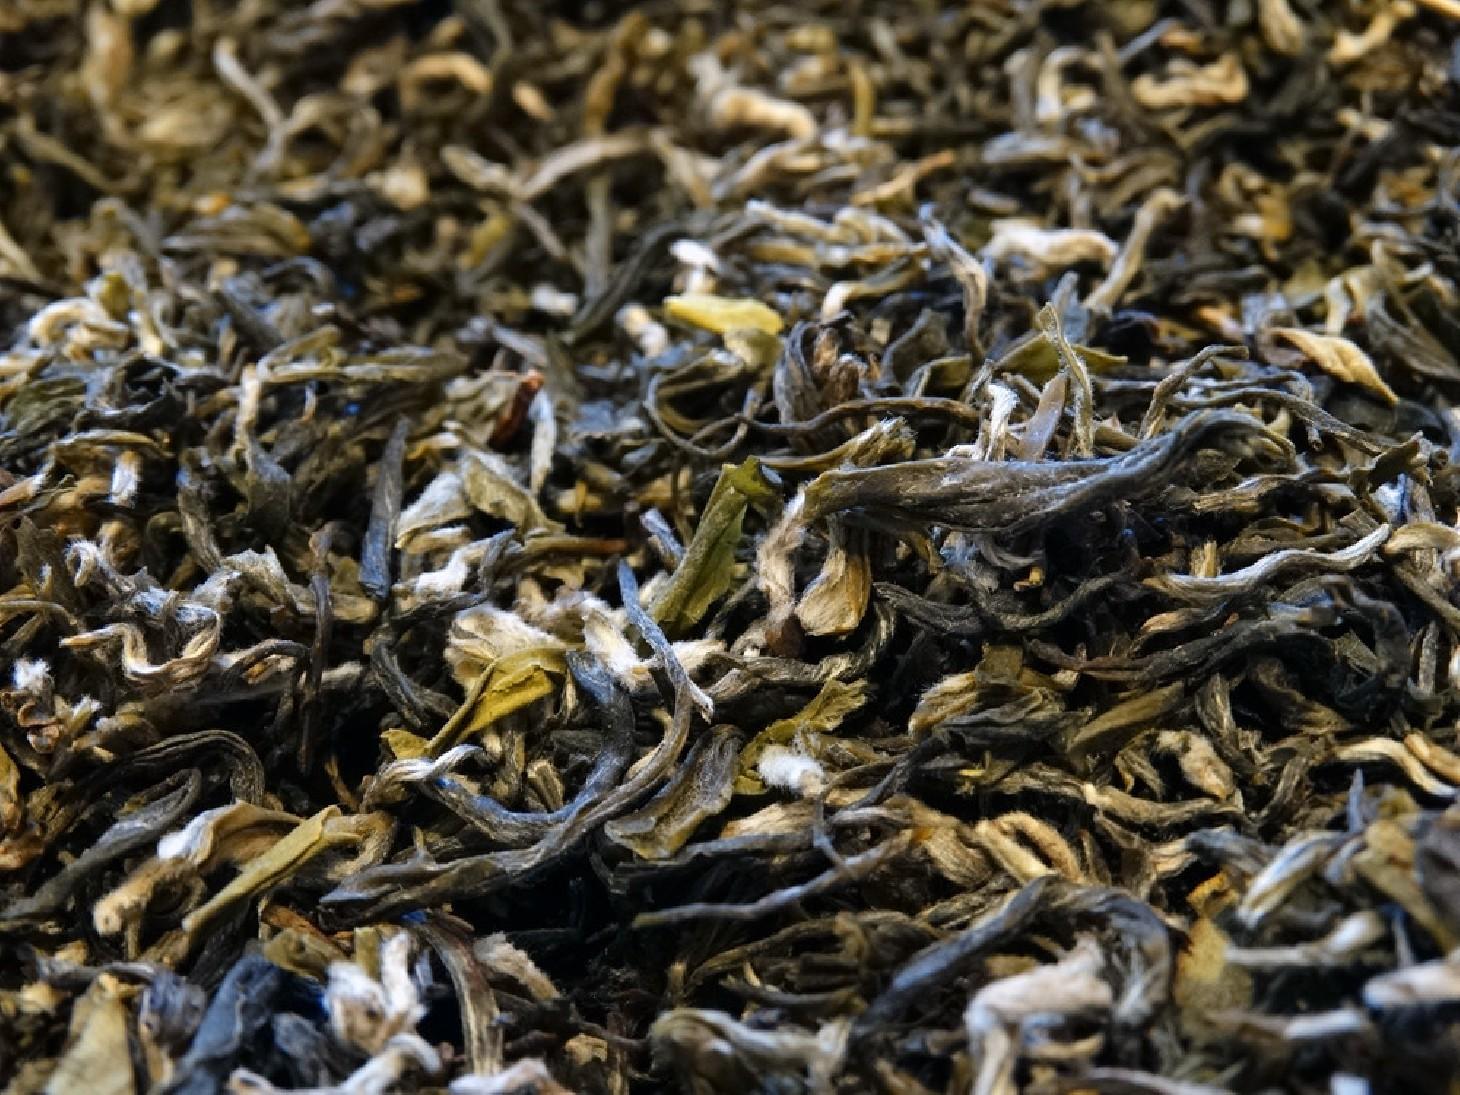 Thé vert premium pi lo shun de Formose grand jardin Taiwan Tea & cie comptoir de thé à Vannes